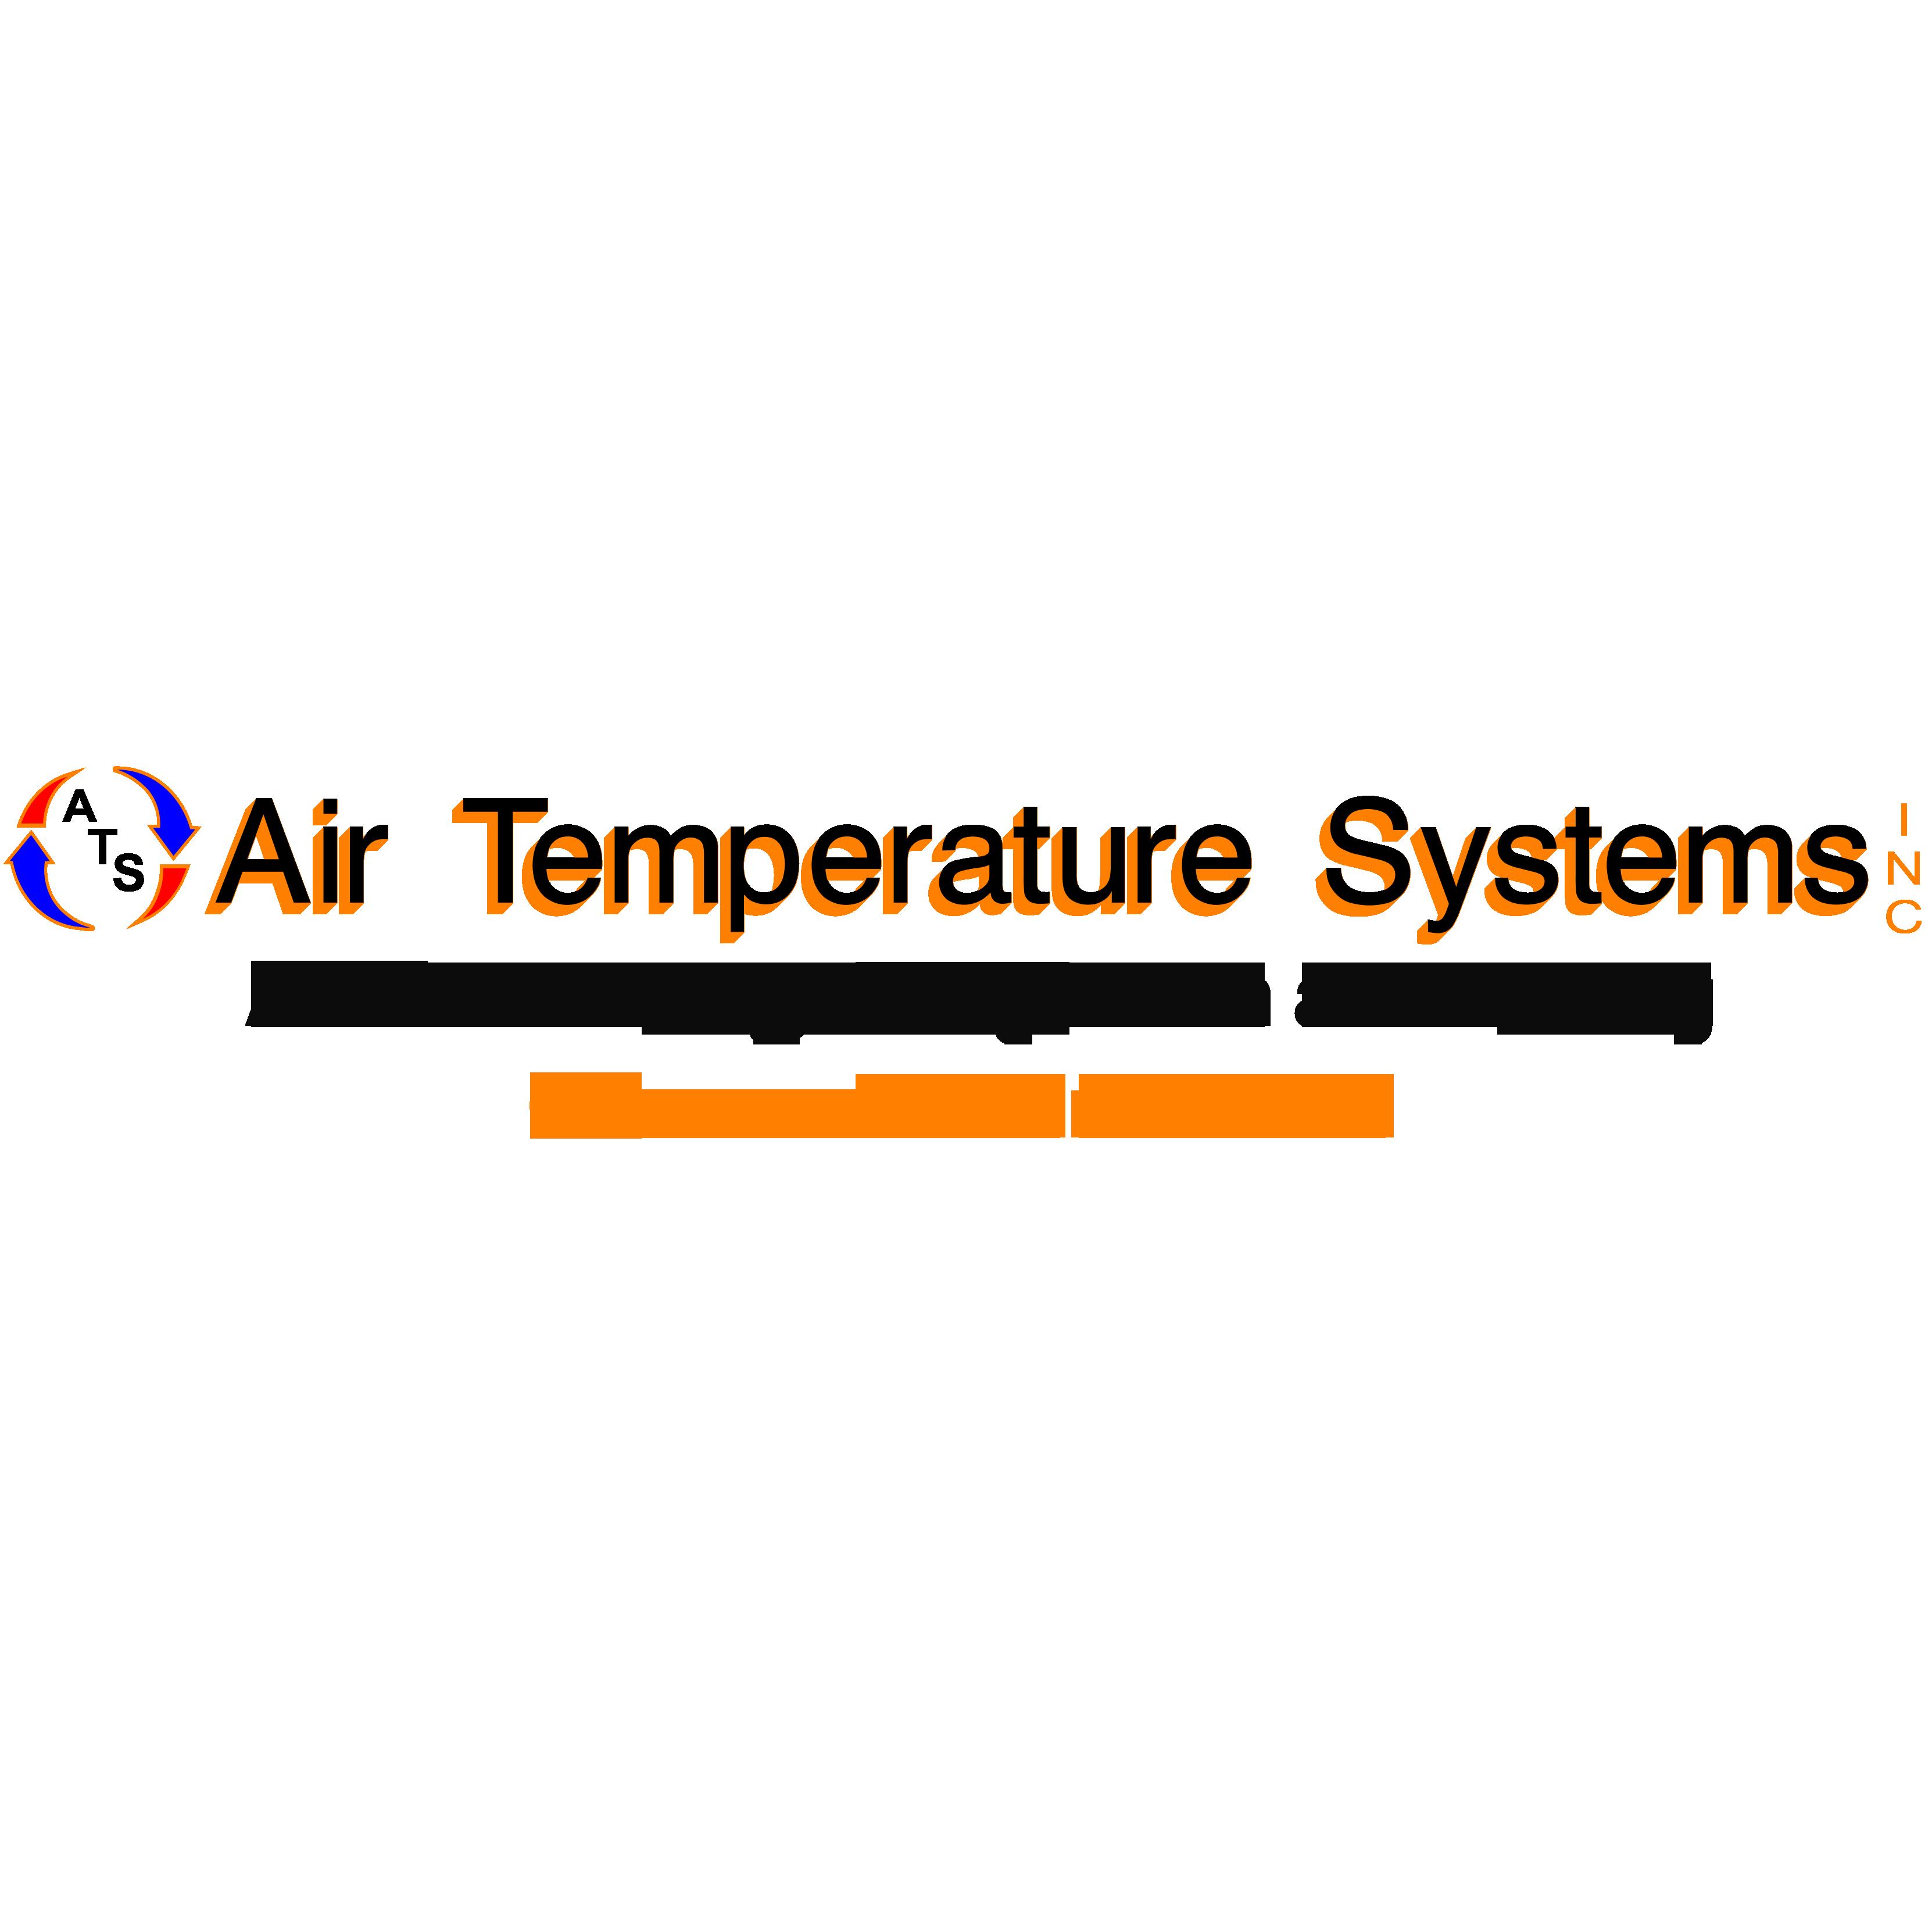 Air Temperature Systems Inc